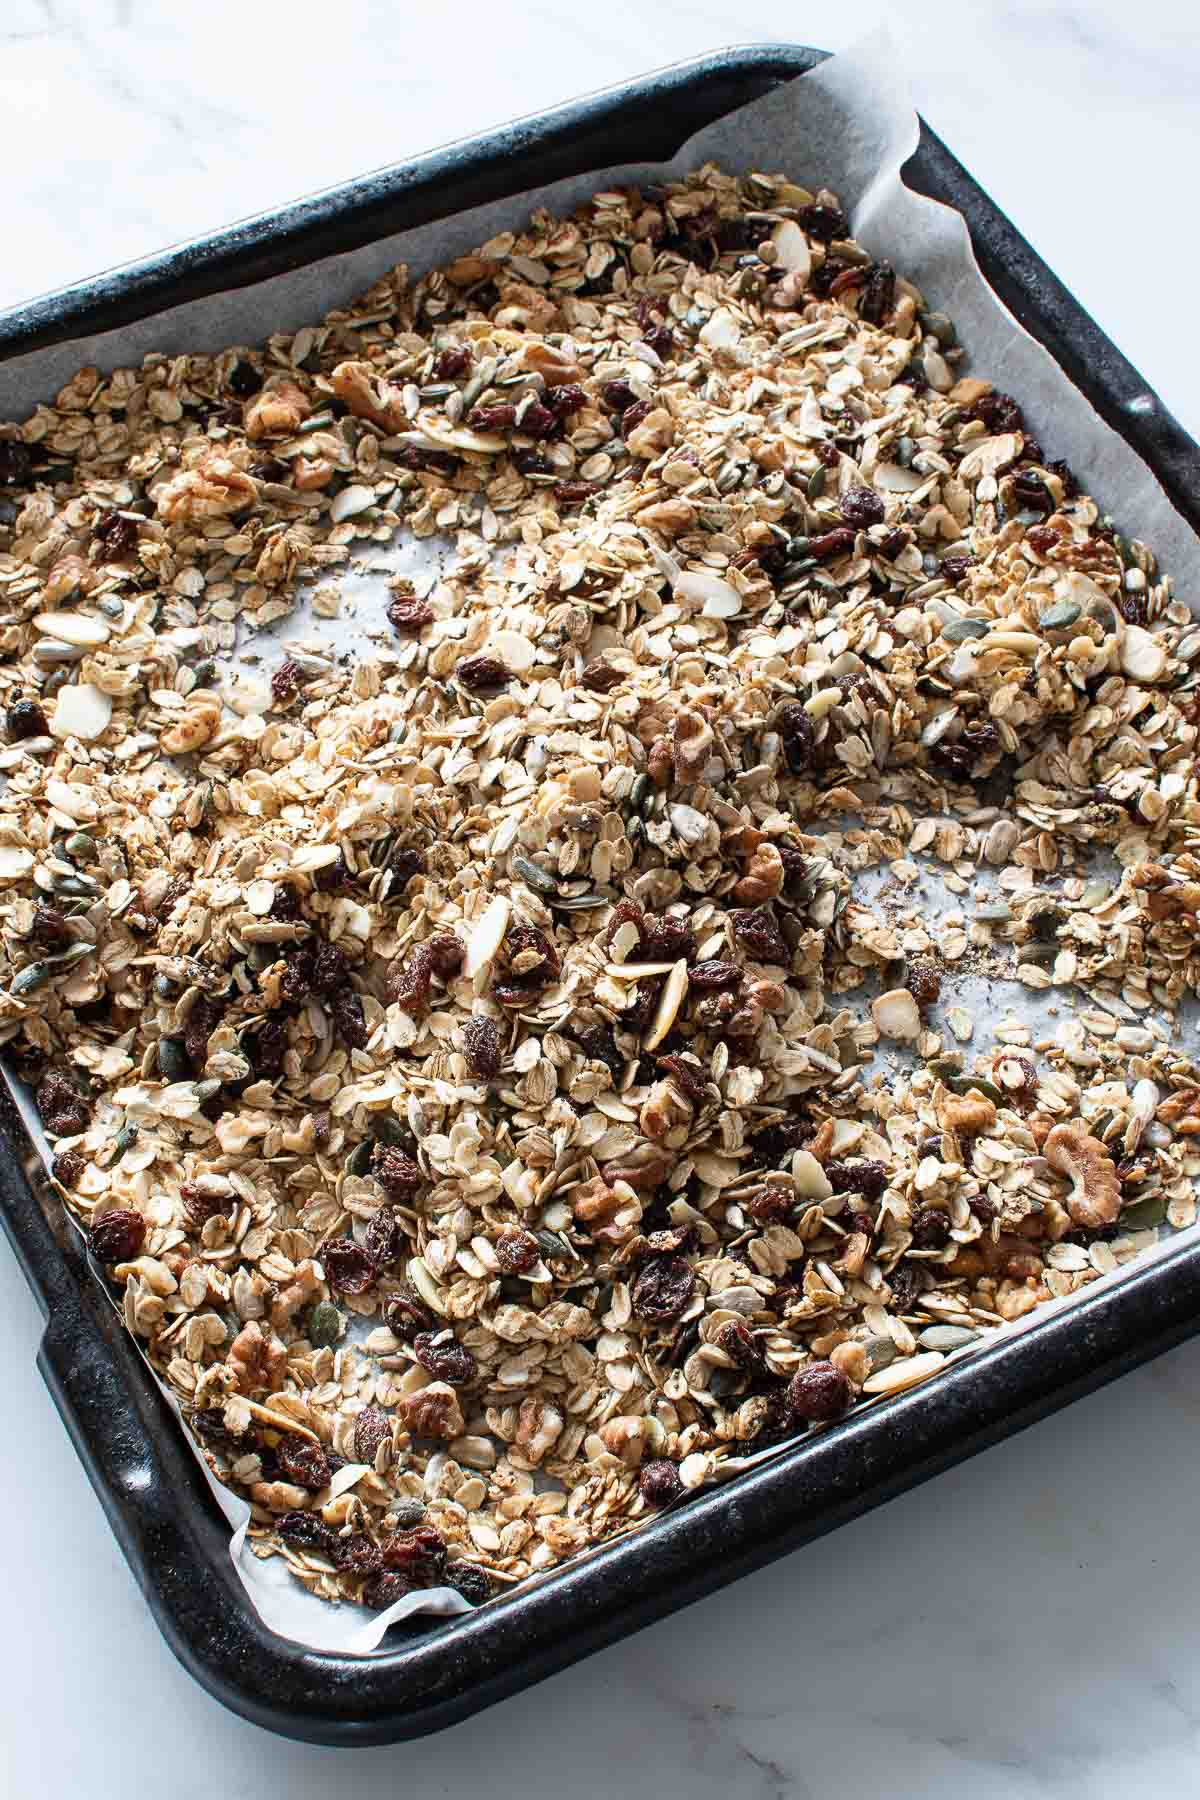 Baked muesli on a baking sheet.